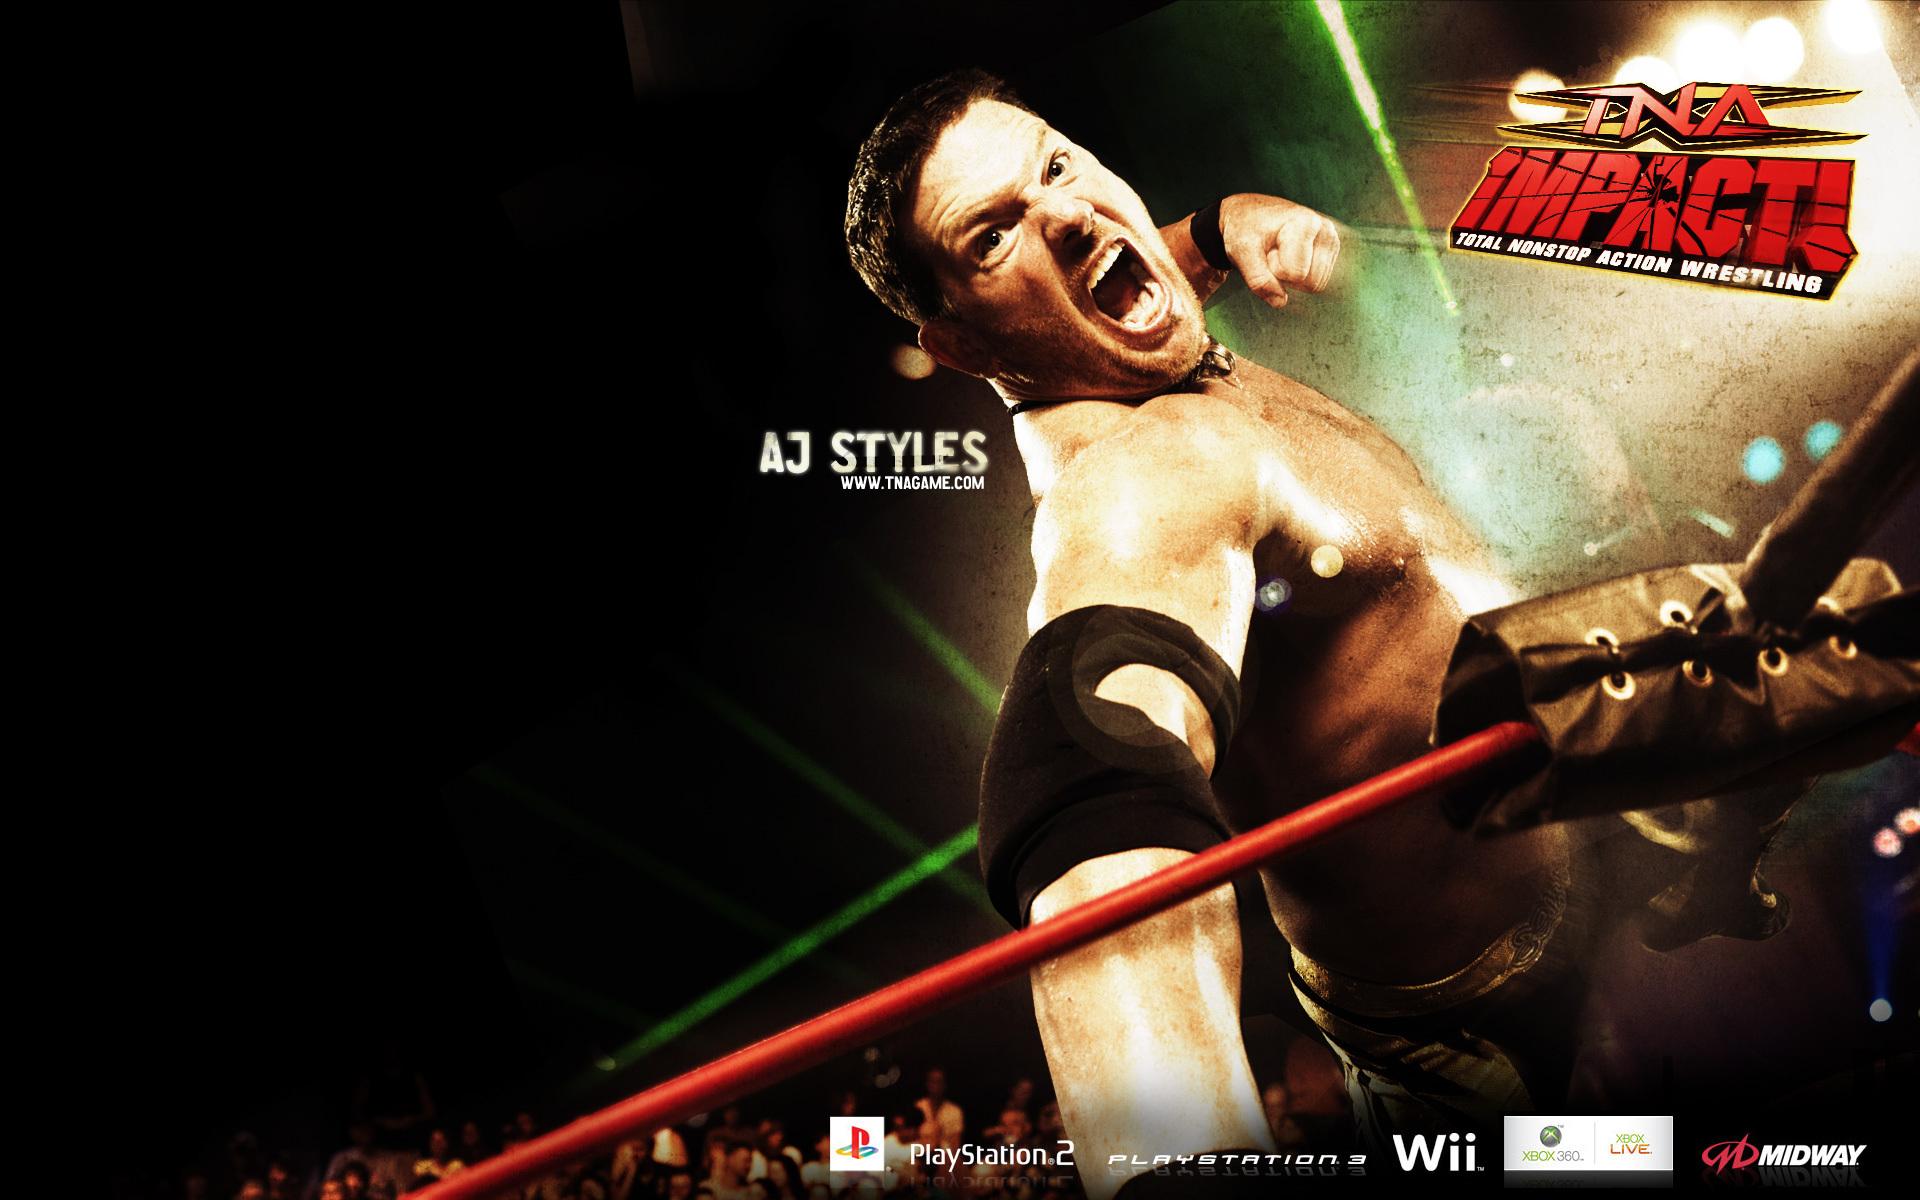 aj styles   TNA Wrestling Wallpaper 11396957 1920x1200